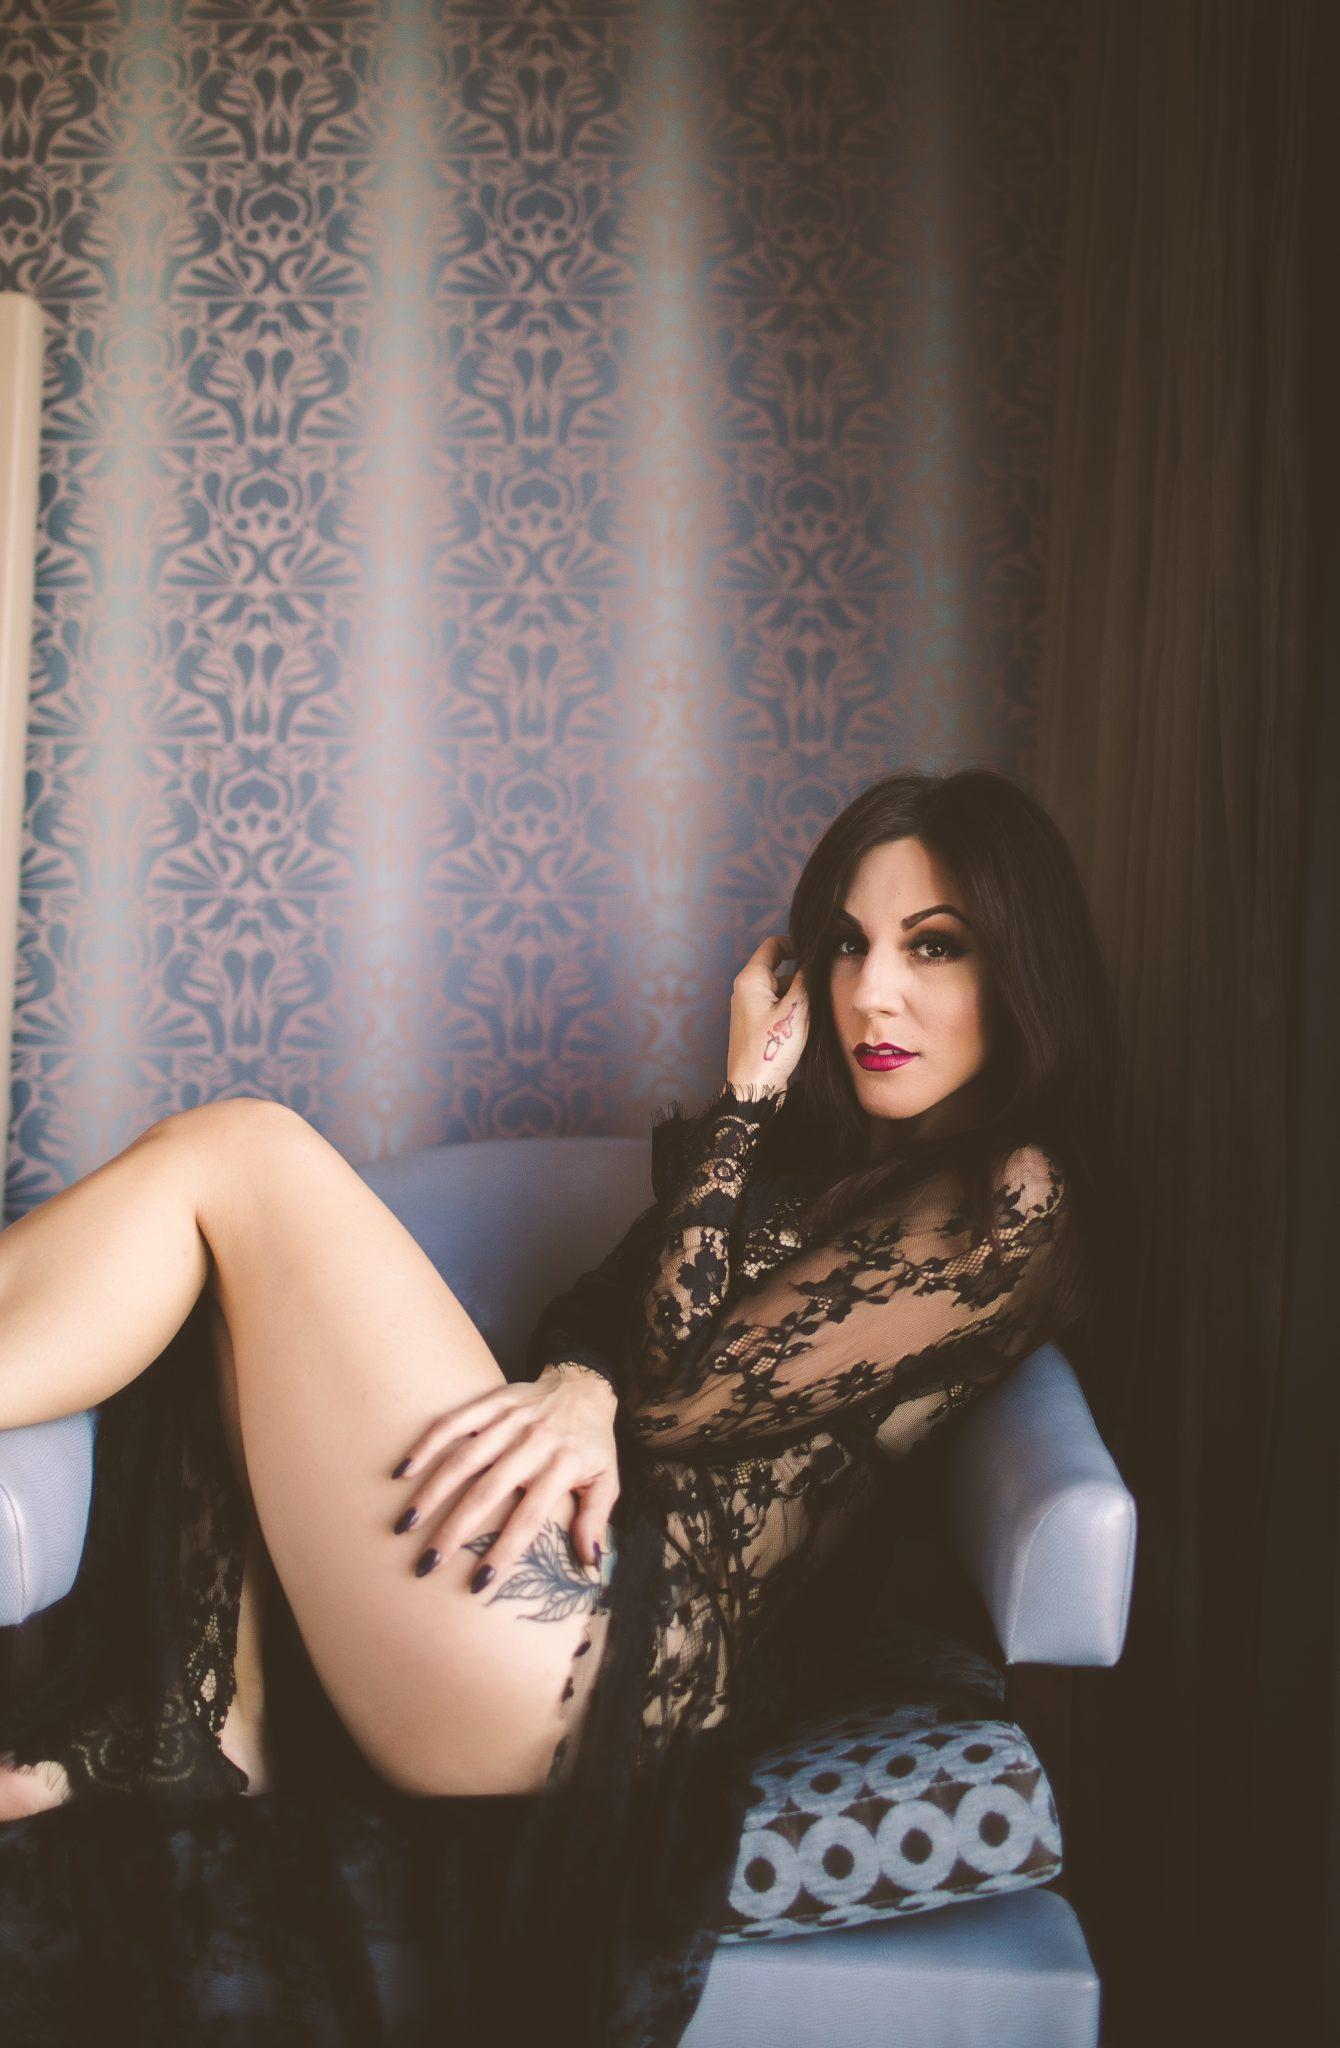 A woman taking boudoir photos